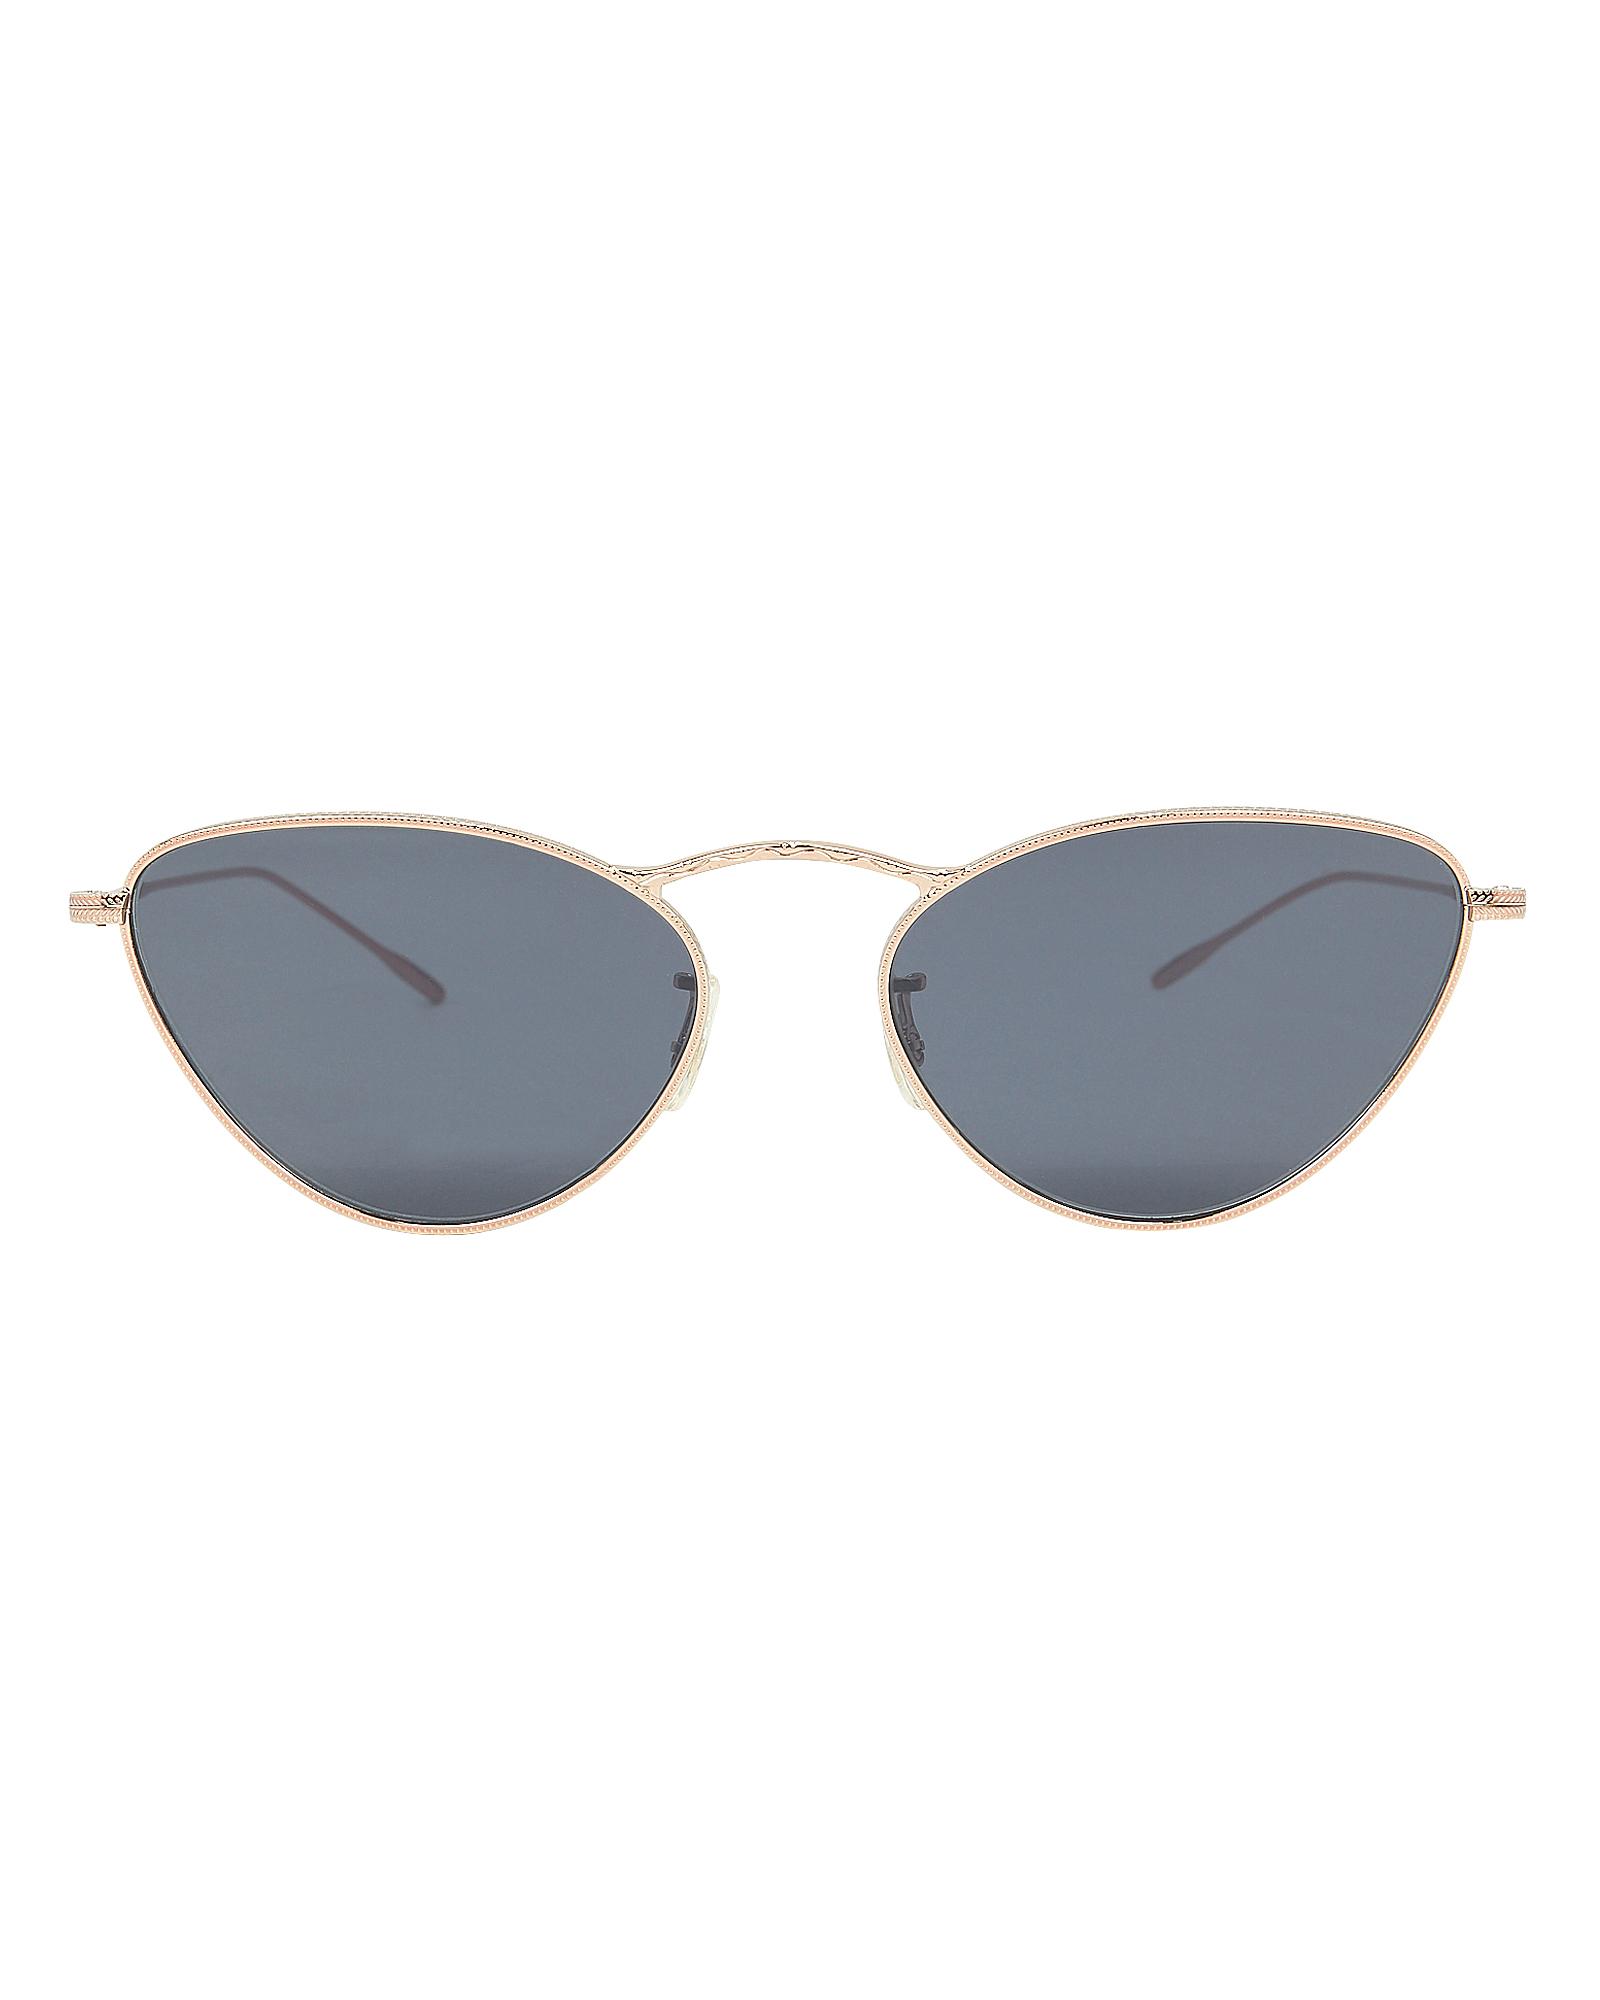 OLIVER PEOPLES Lelaina 56Mm Cat Eye Sunglasses - Carbon Gray/ Gold